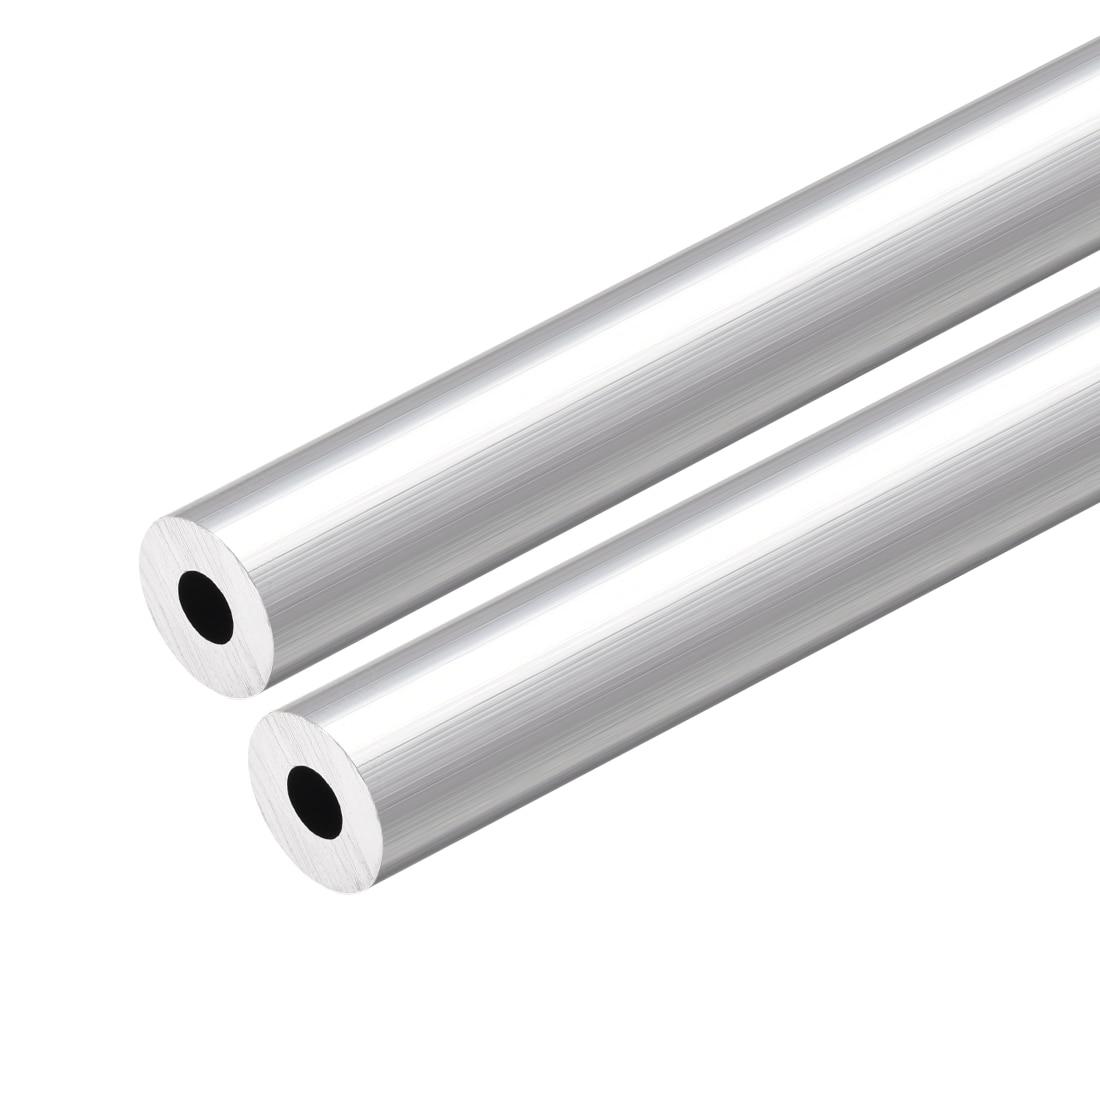 Uxcell 6063 Aluminum Round Tube 300mm Length 12mm OD 5mm Inner Dia Seamless Aluminum Straight Tubing 2 Pcs